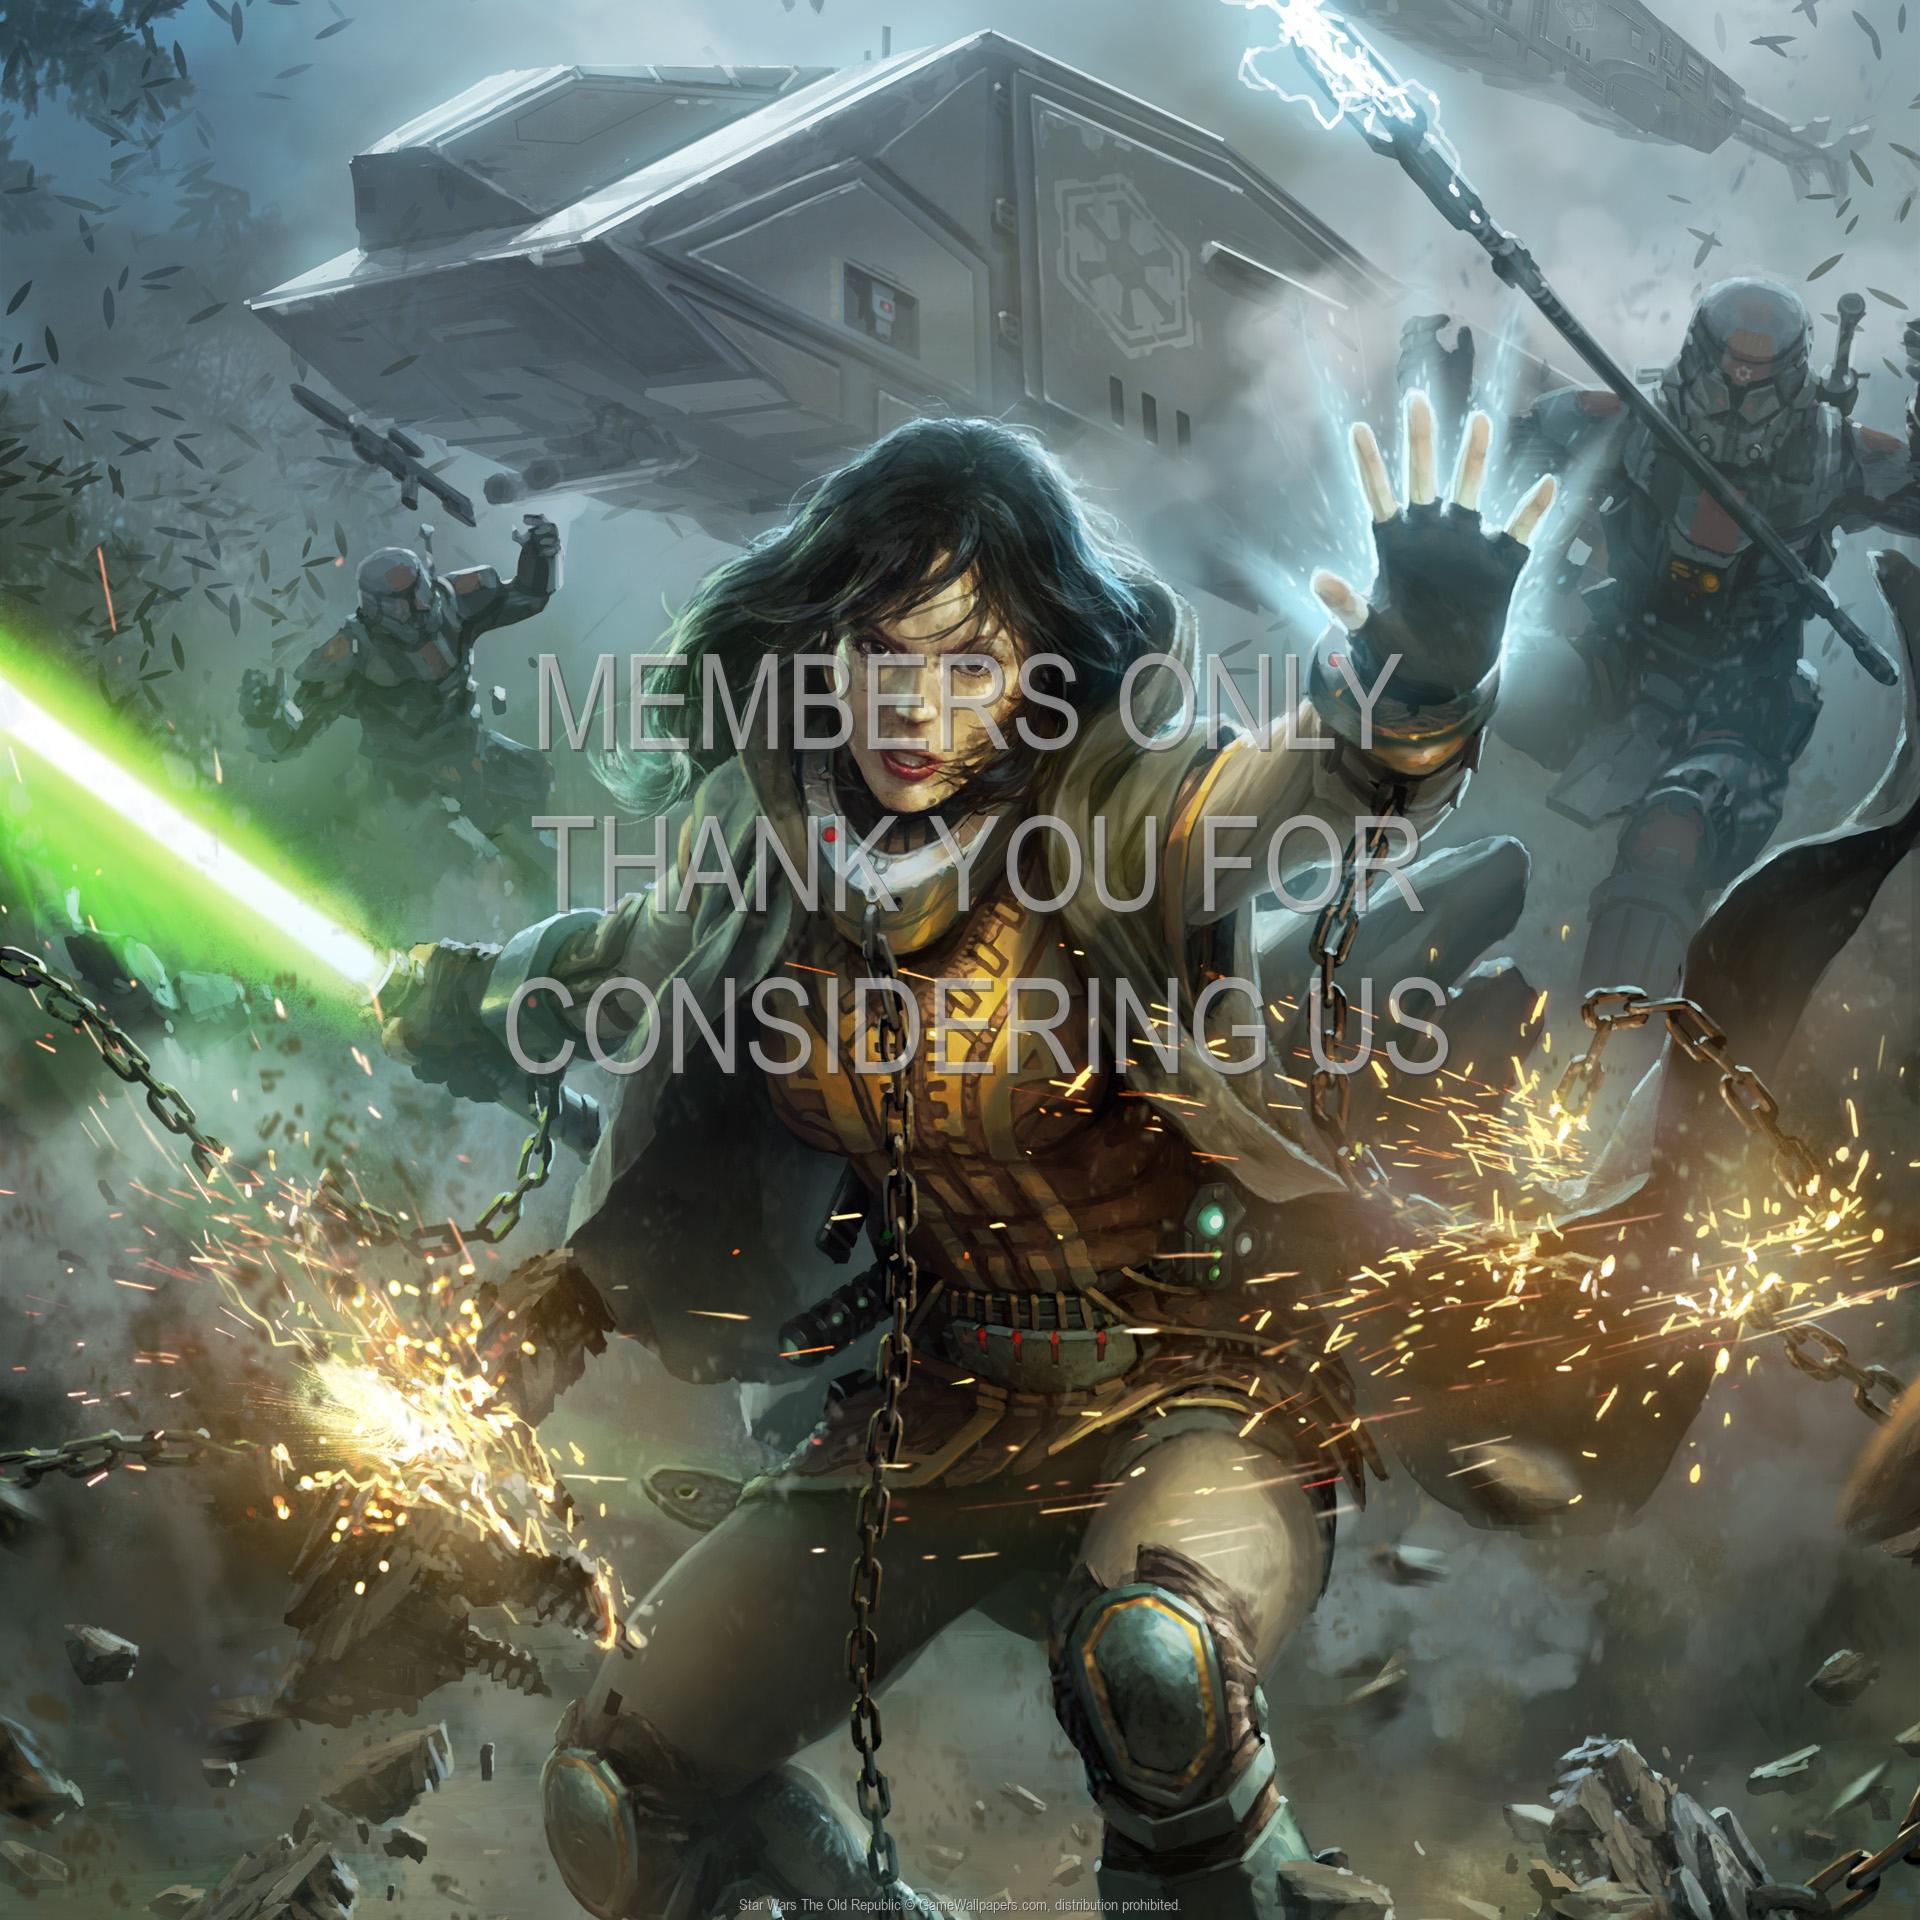 Star Wars The Old Republic Fondo De Escritorio 09 1920x1080